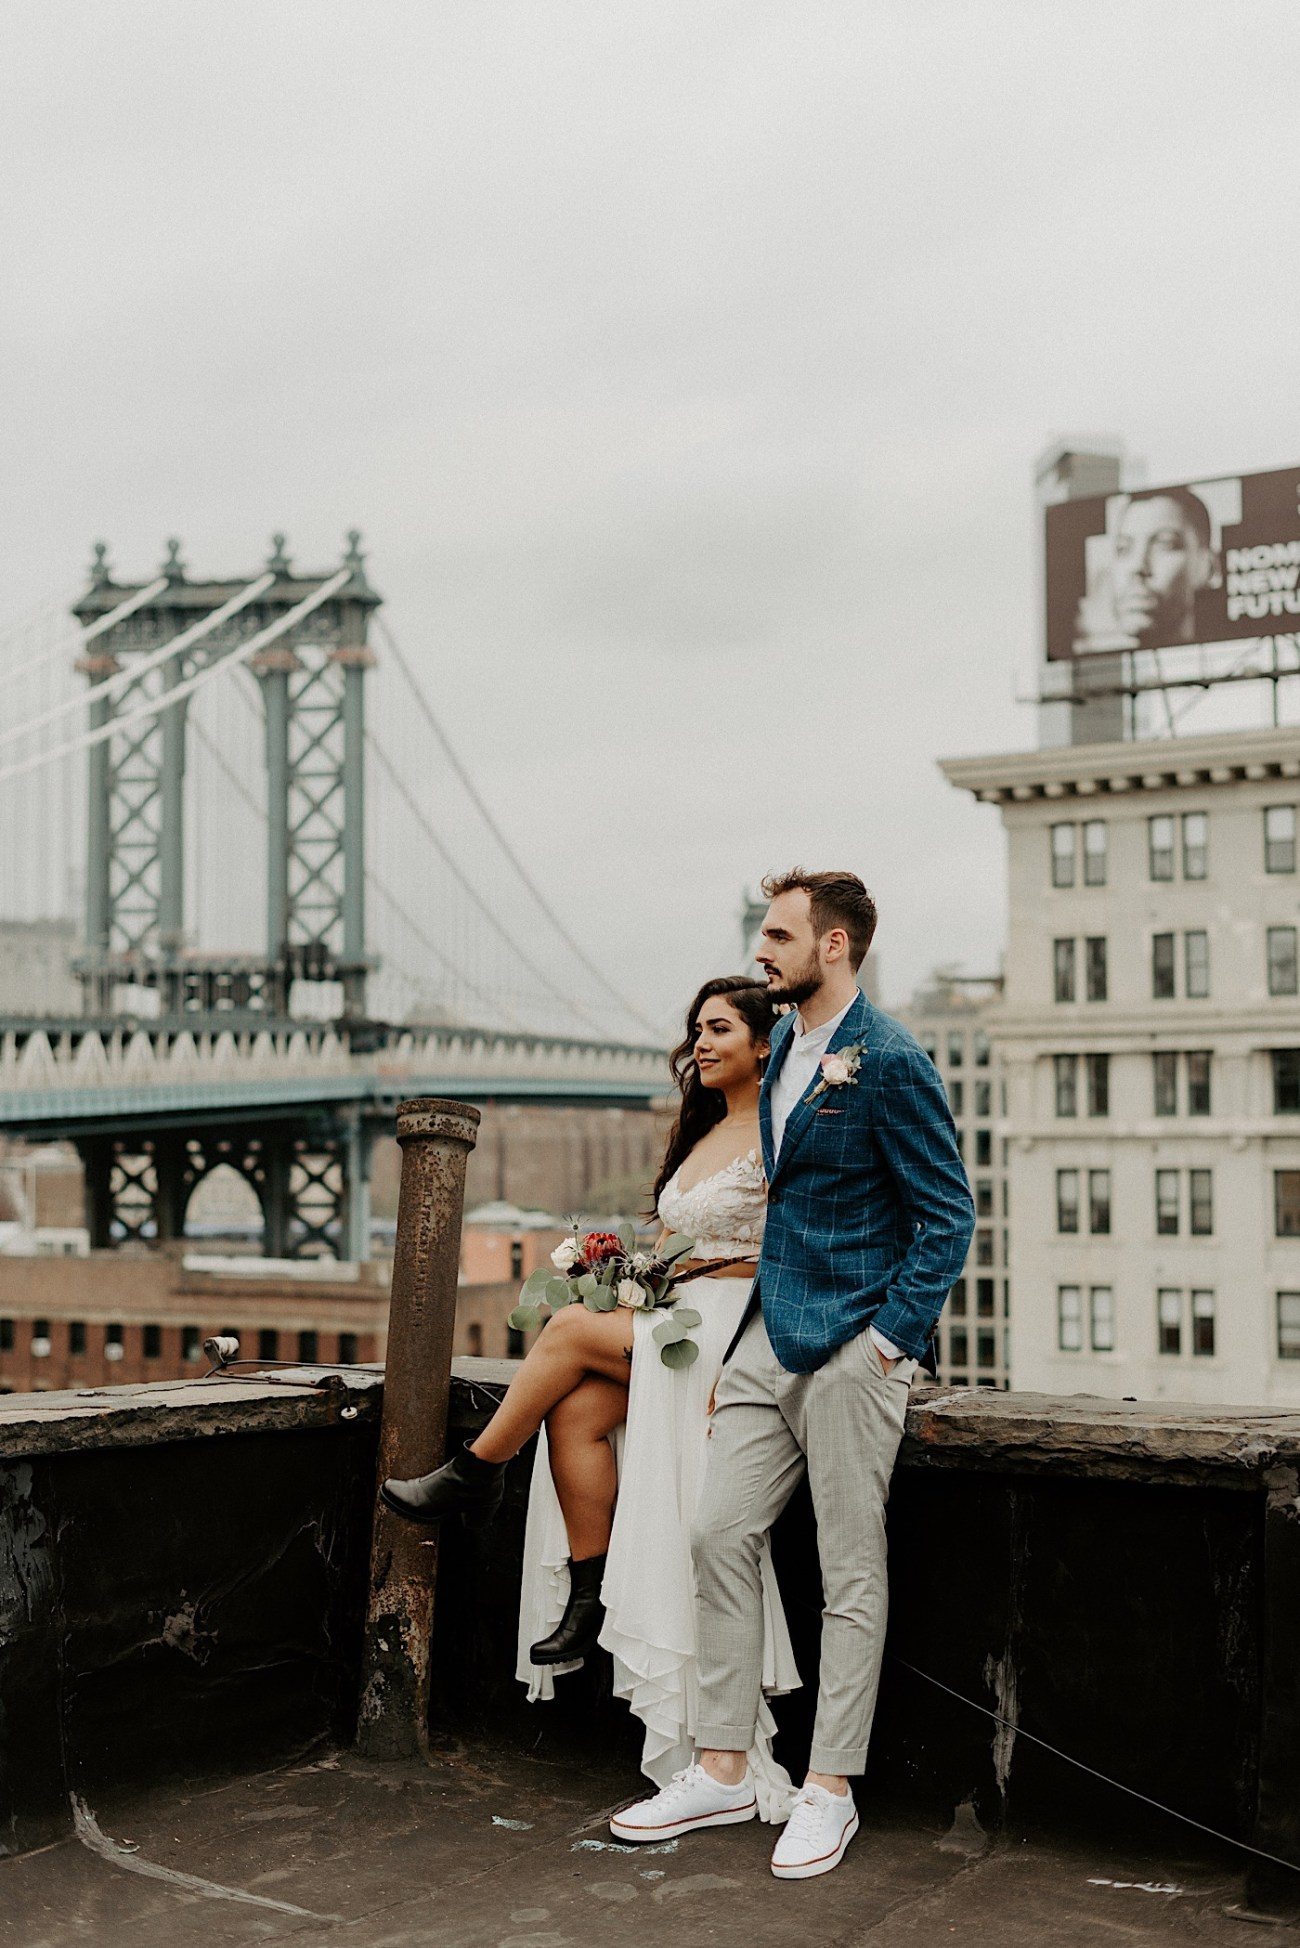 LIC Wedding Greenpoint Wedding LIC Elopement New York Wedding Photographer 082